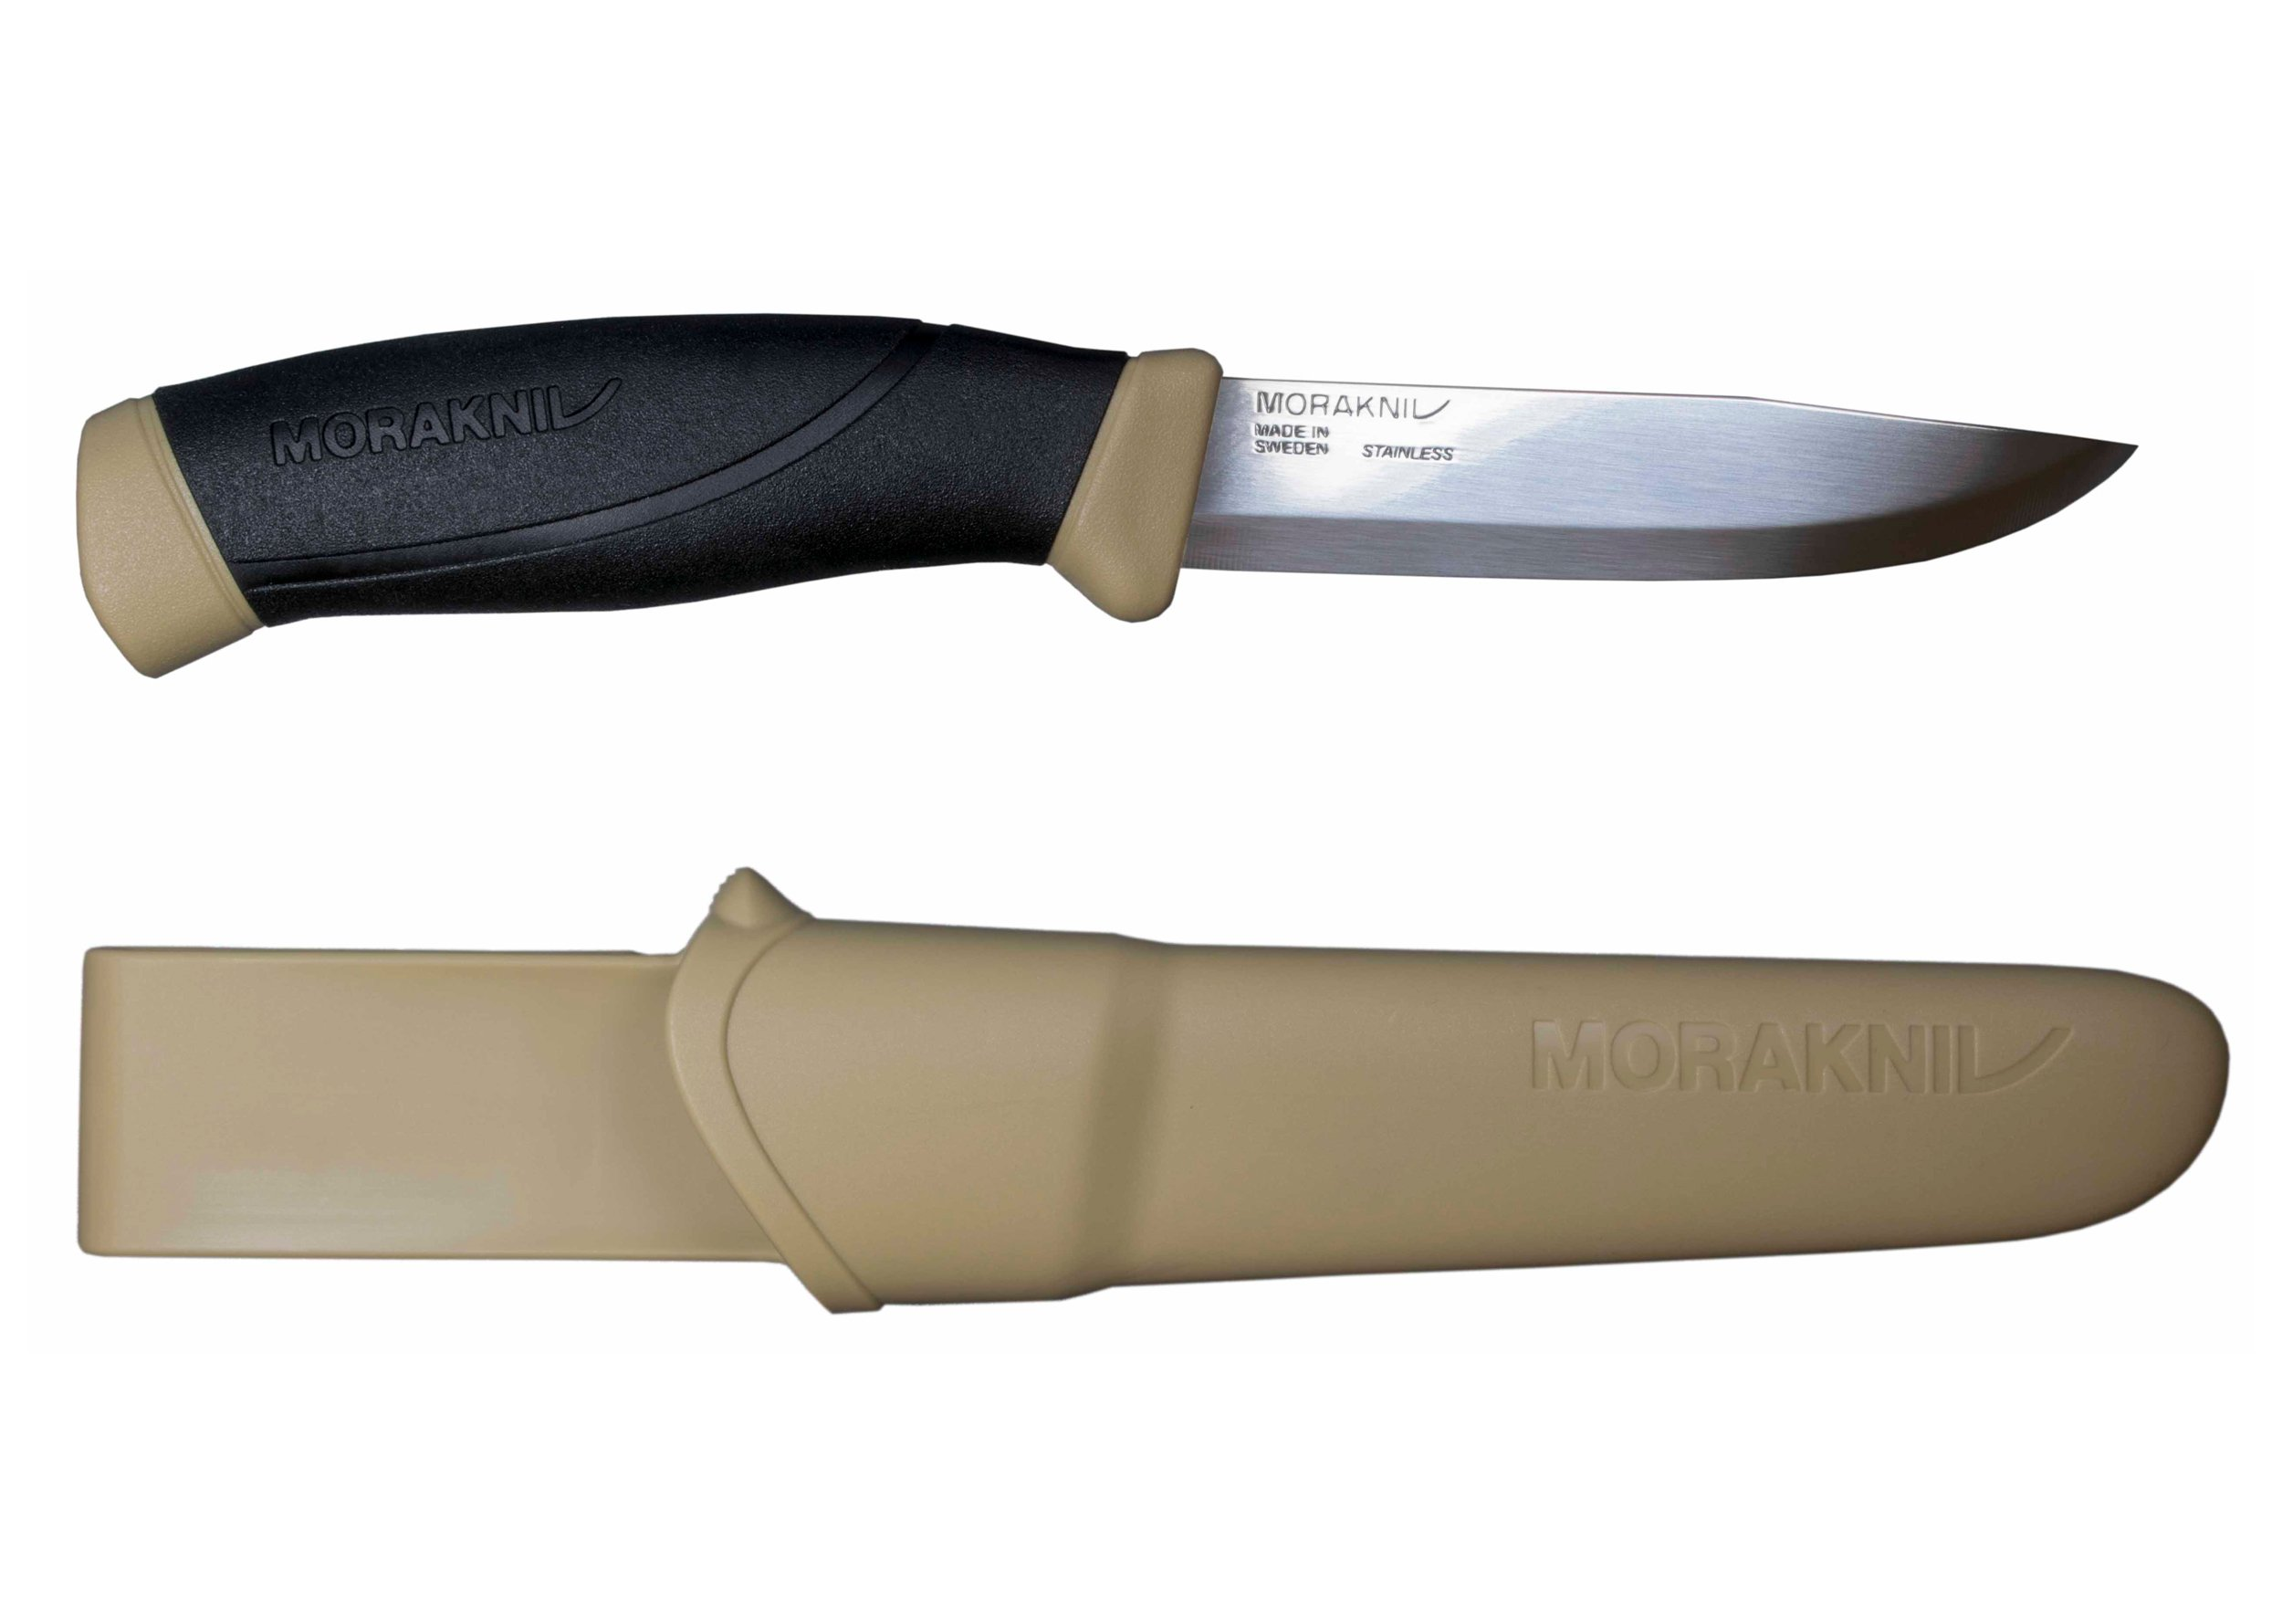 Morakniv Companion Fixed Blade Outdoor Knife with Sandvik Stainless Steel Blade, 4.1-Inch, Desert Tan